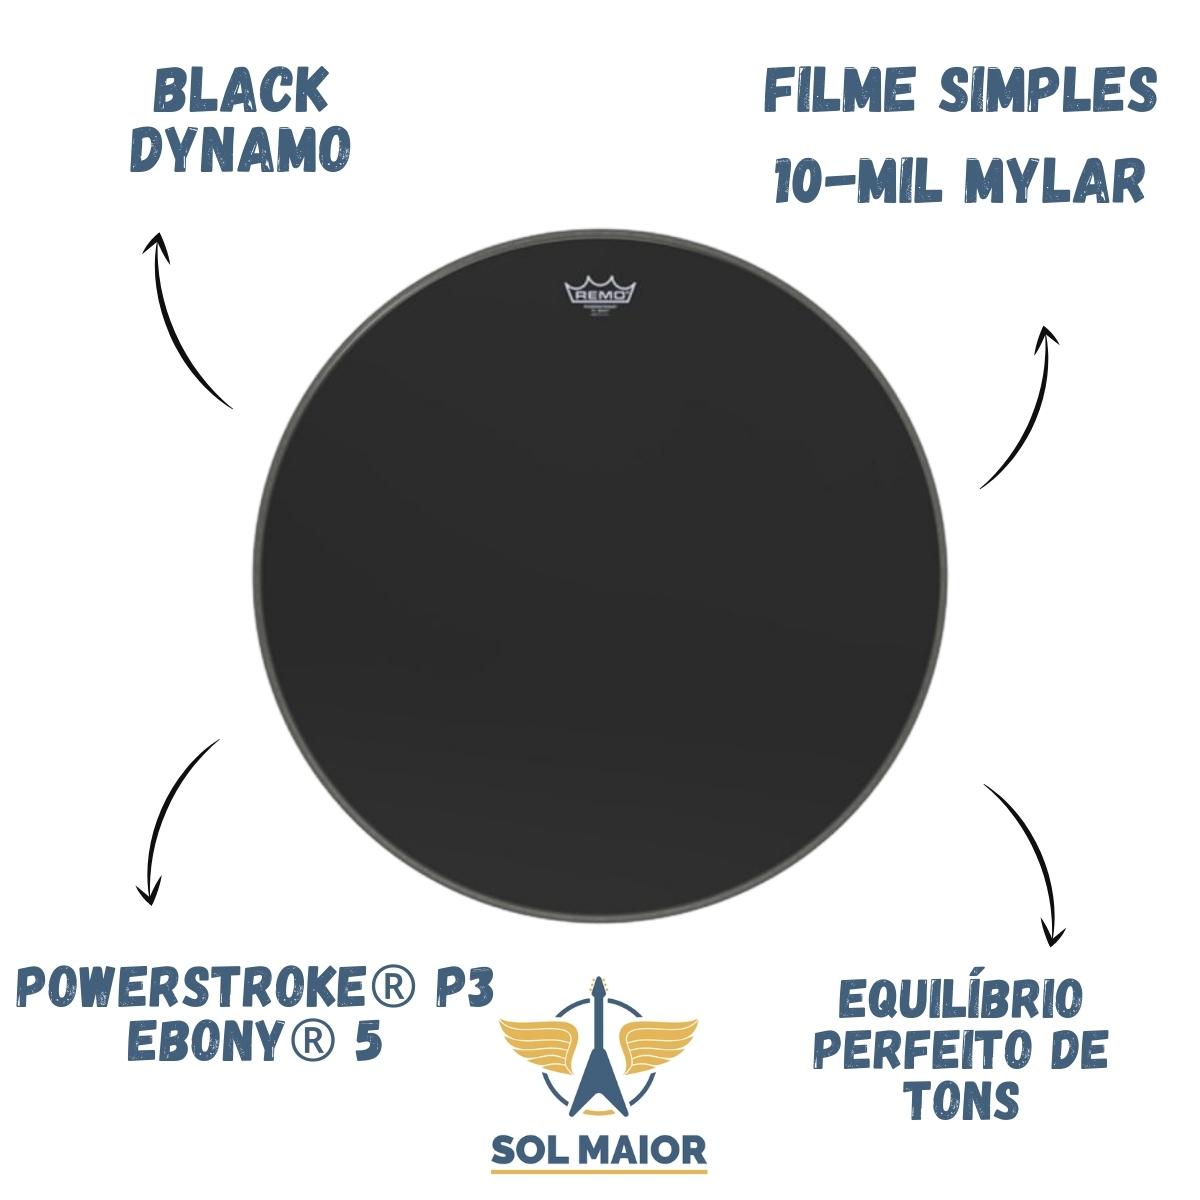 "Pele Remo 26"" Powerstroke 3 Ebony Black Dynamo P3-1026-ES"